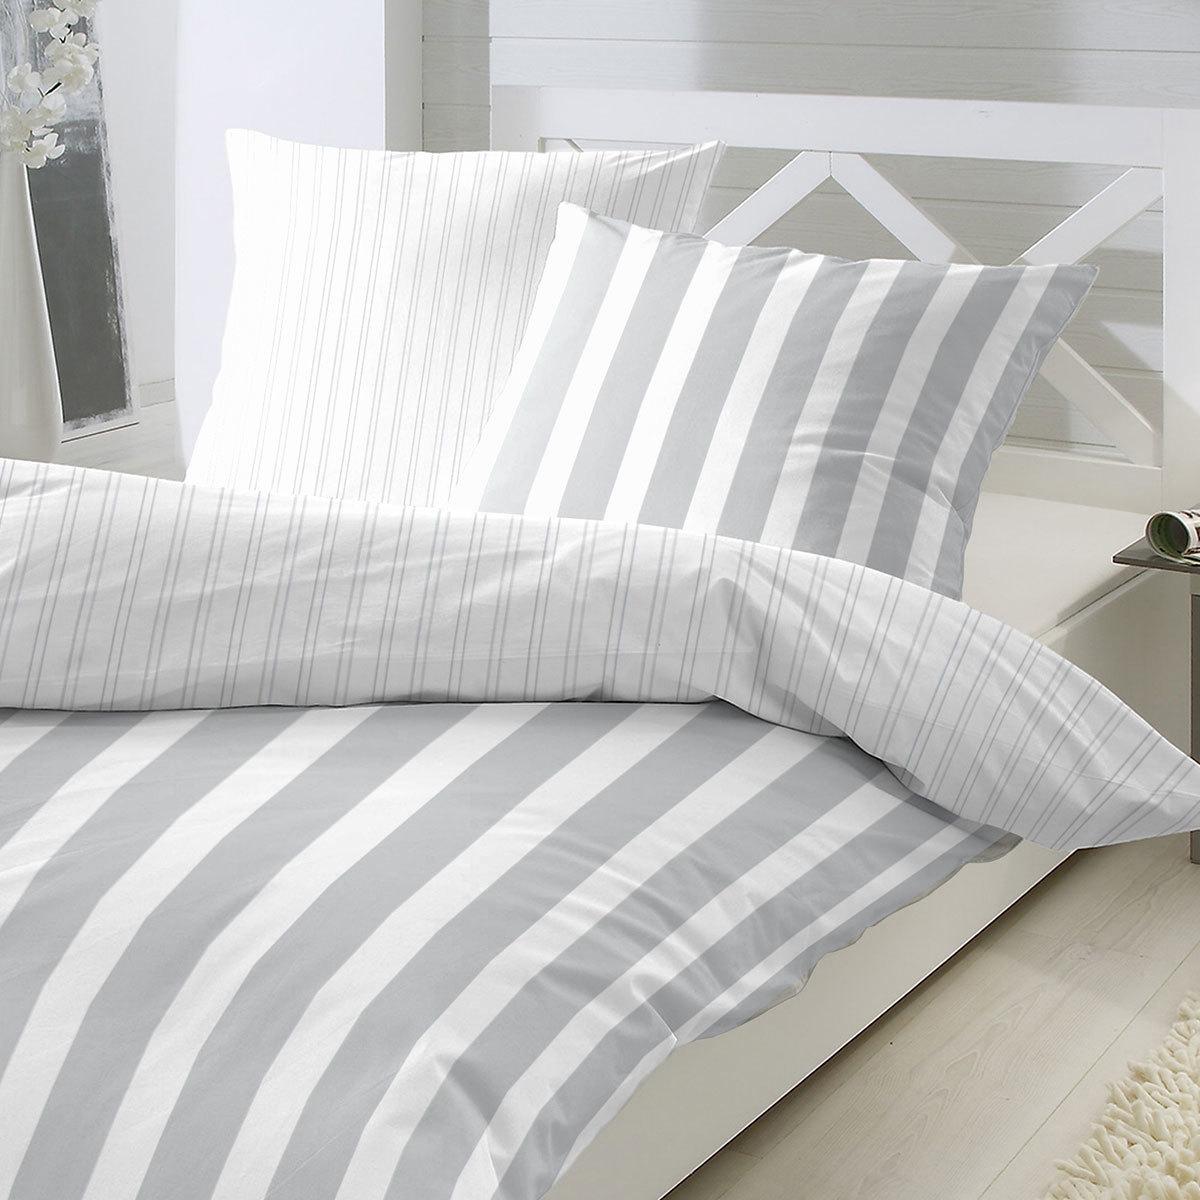 enrico coss perkal bettw sche blockstreifen grau g nstig online kaufen bei bettwaren shop. Black Bedroom Furniture Sets. Home Design Ideas